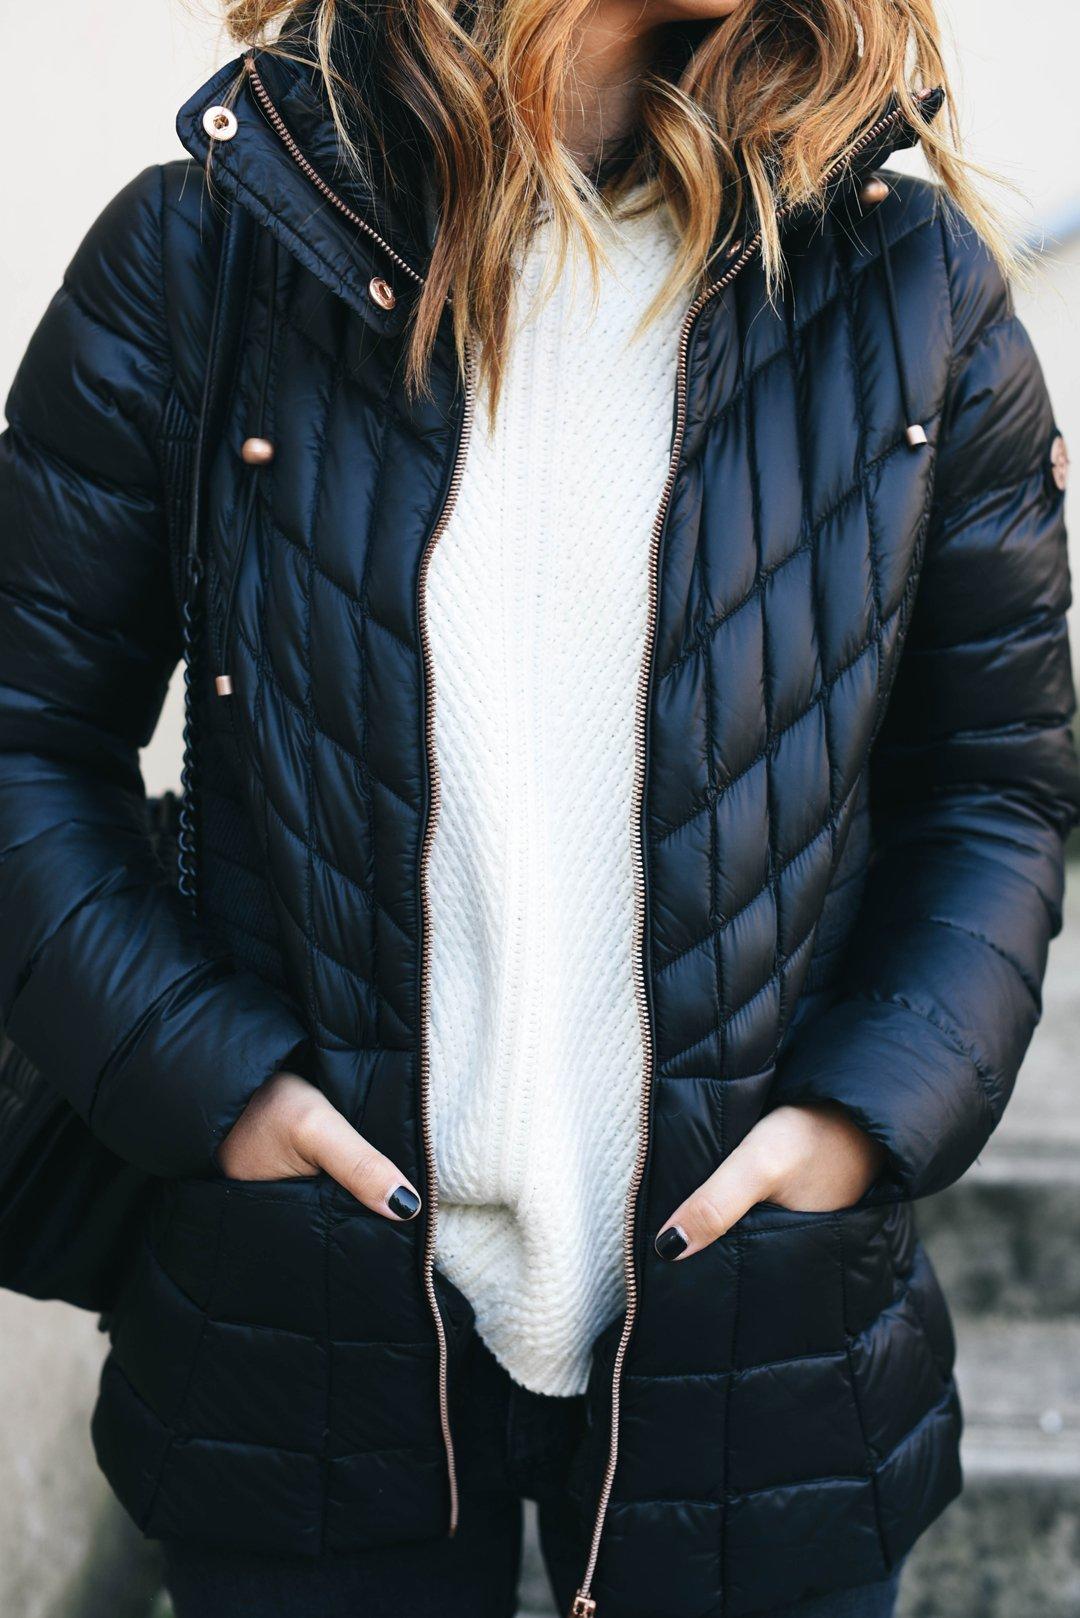 crystalin-marie-wearing-bernardo-packable-jacket-with-down-primaloft-fill